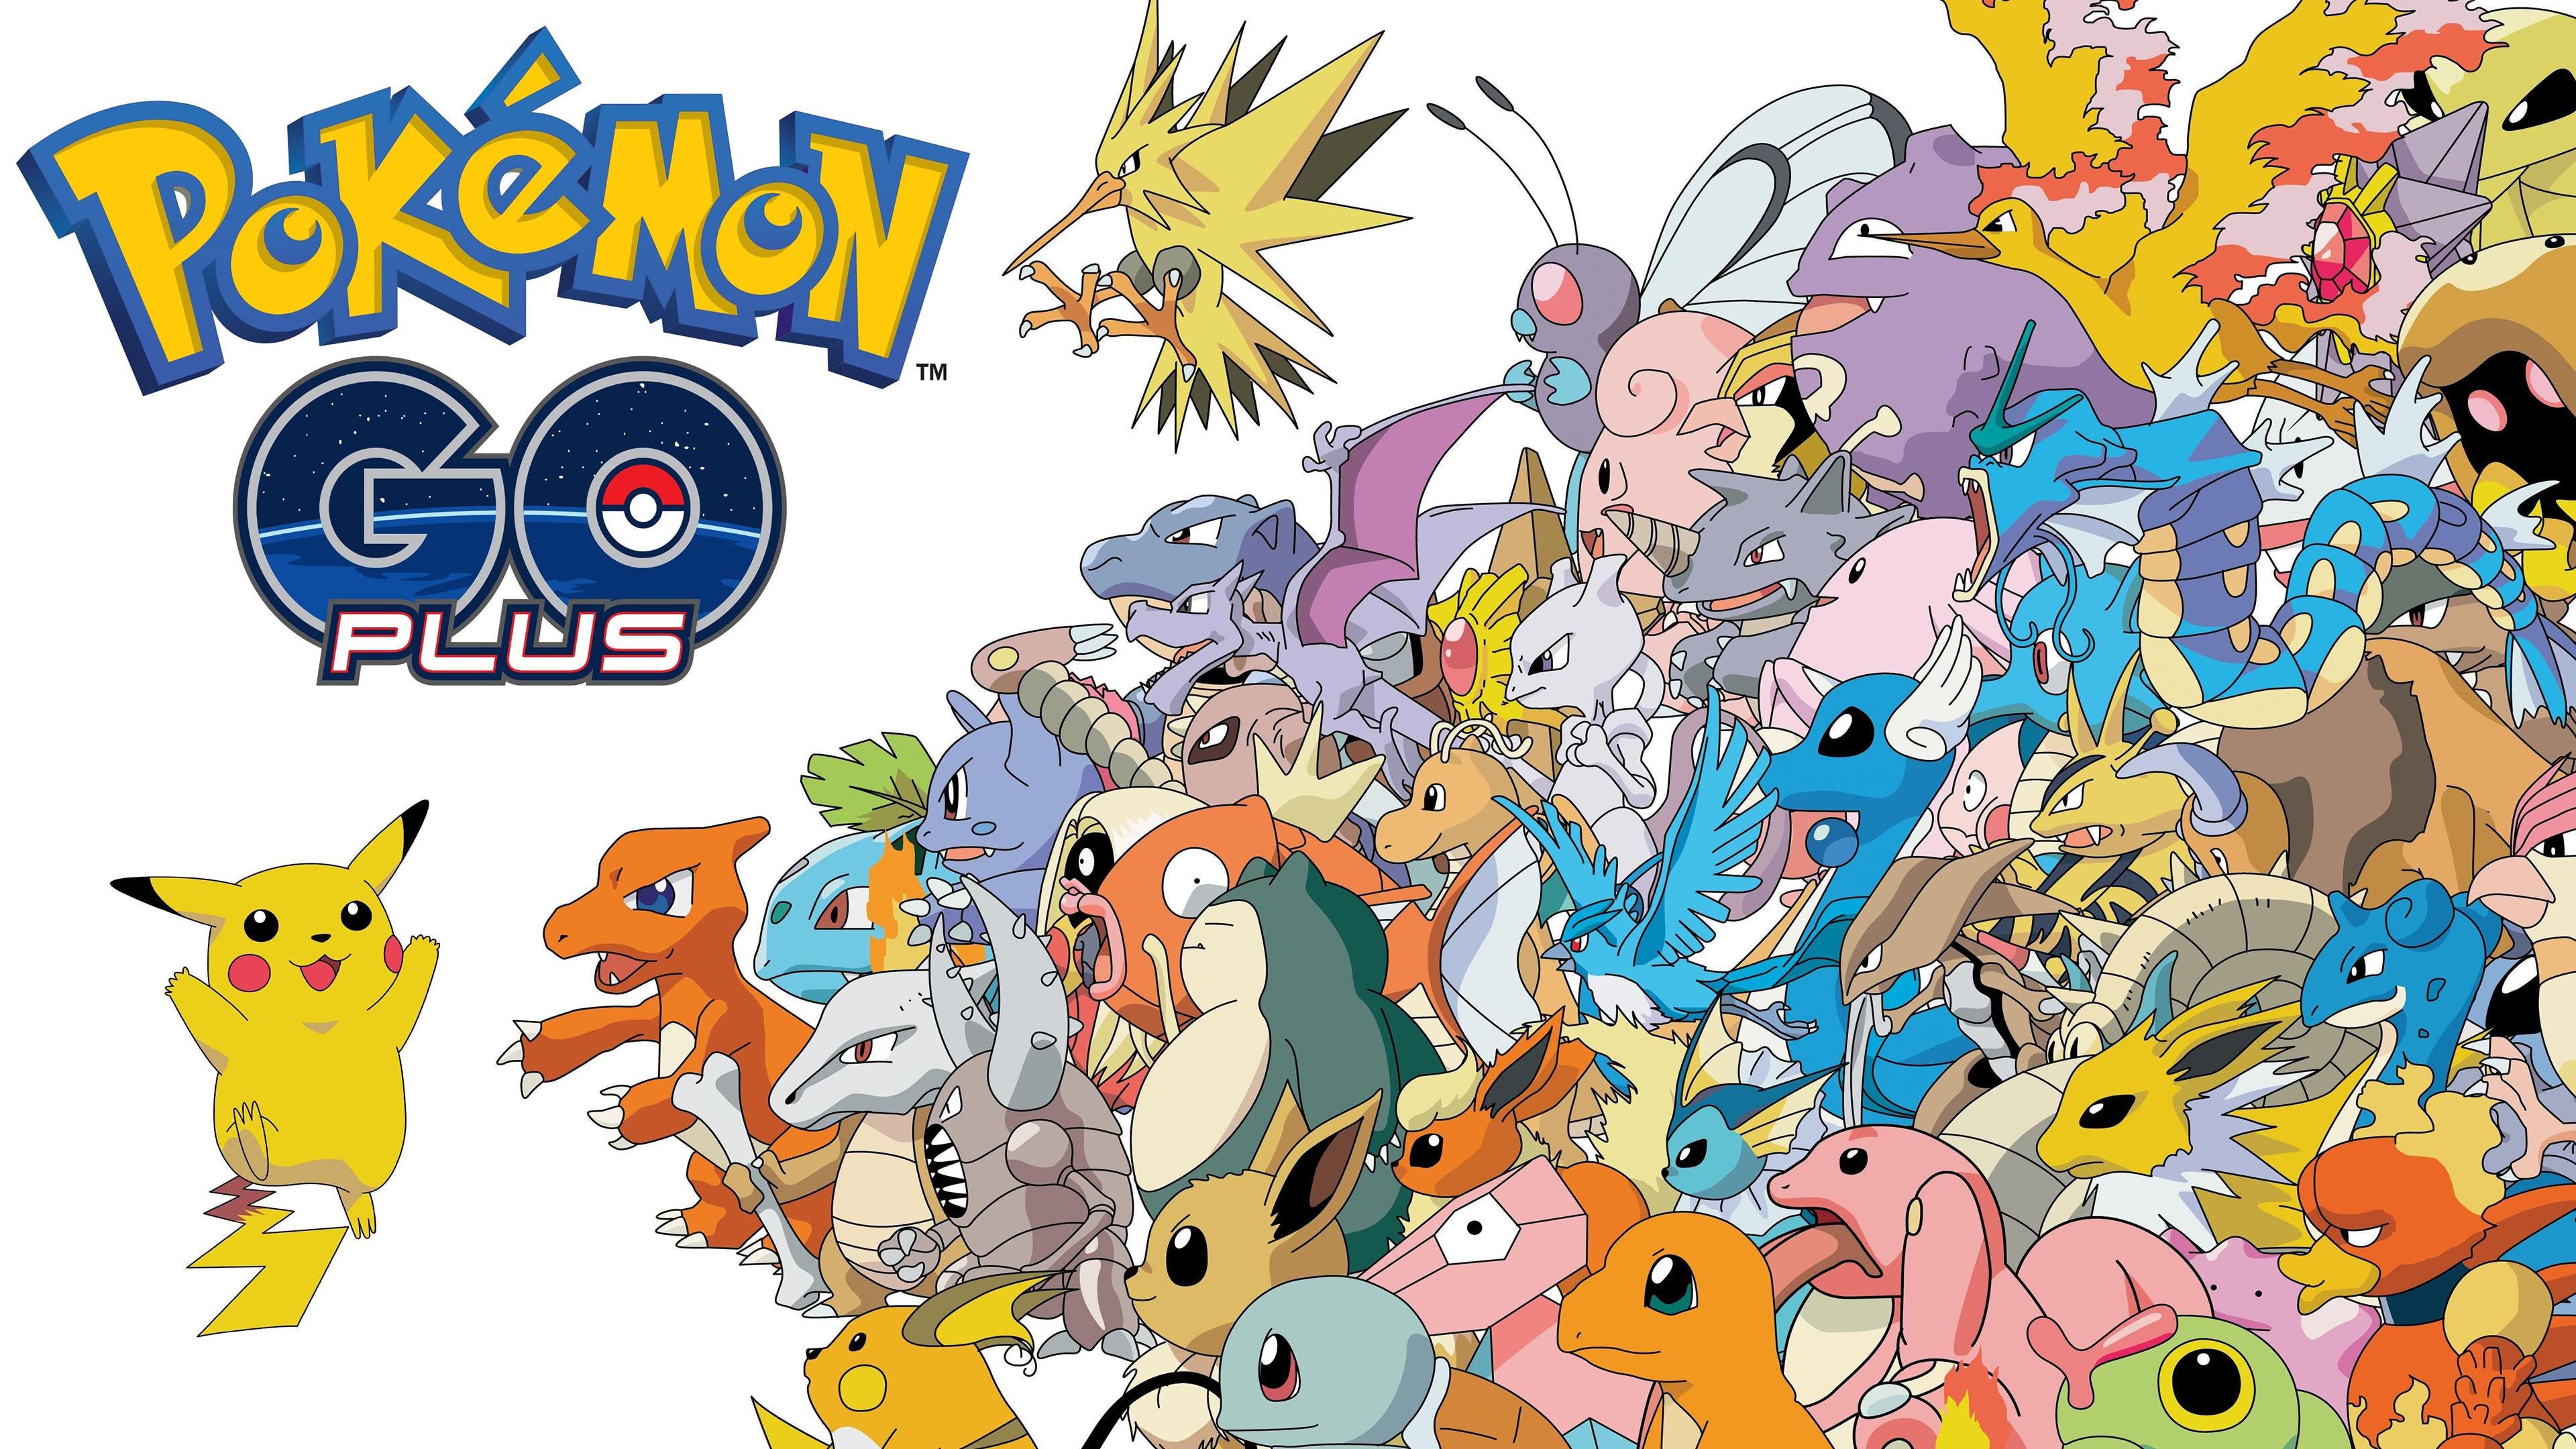 Pokemon Go Plus Uhd 4k Wallpaper Pixelz